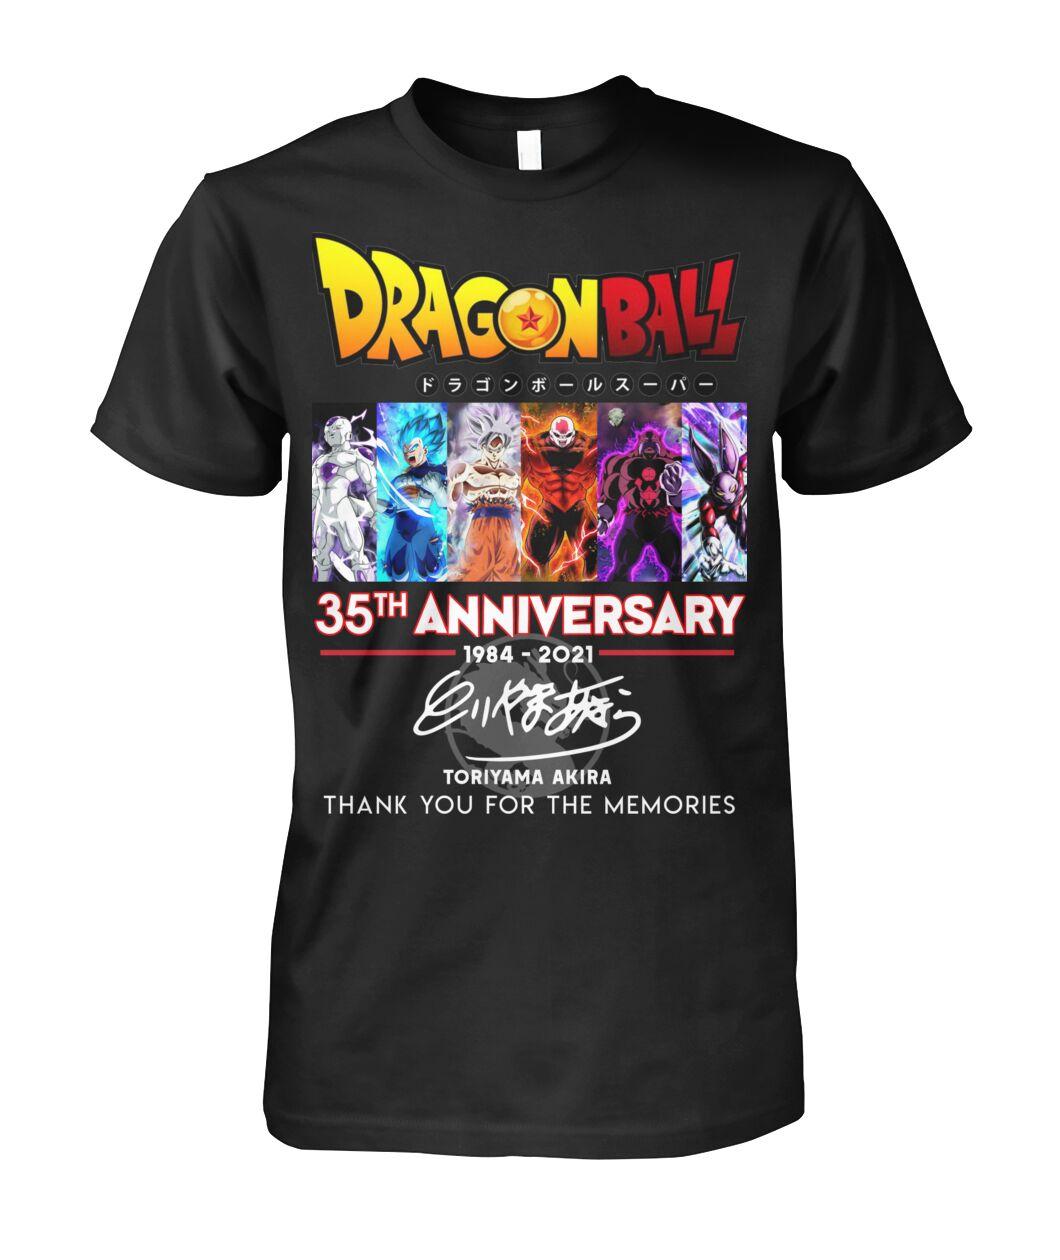 Dragon Ball 35th anniversary shirt